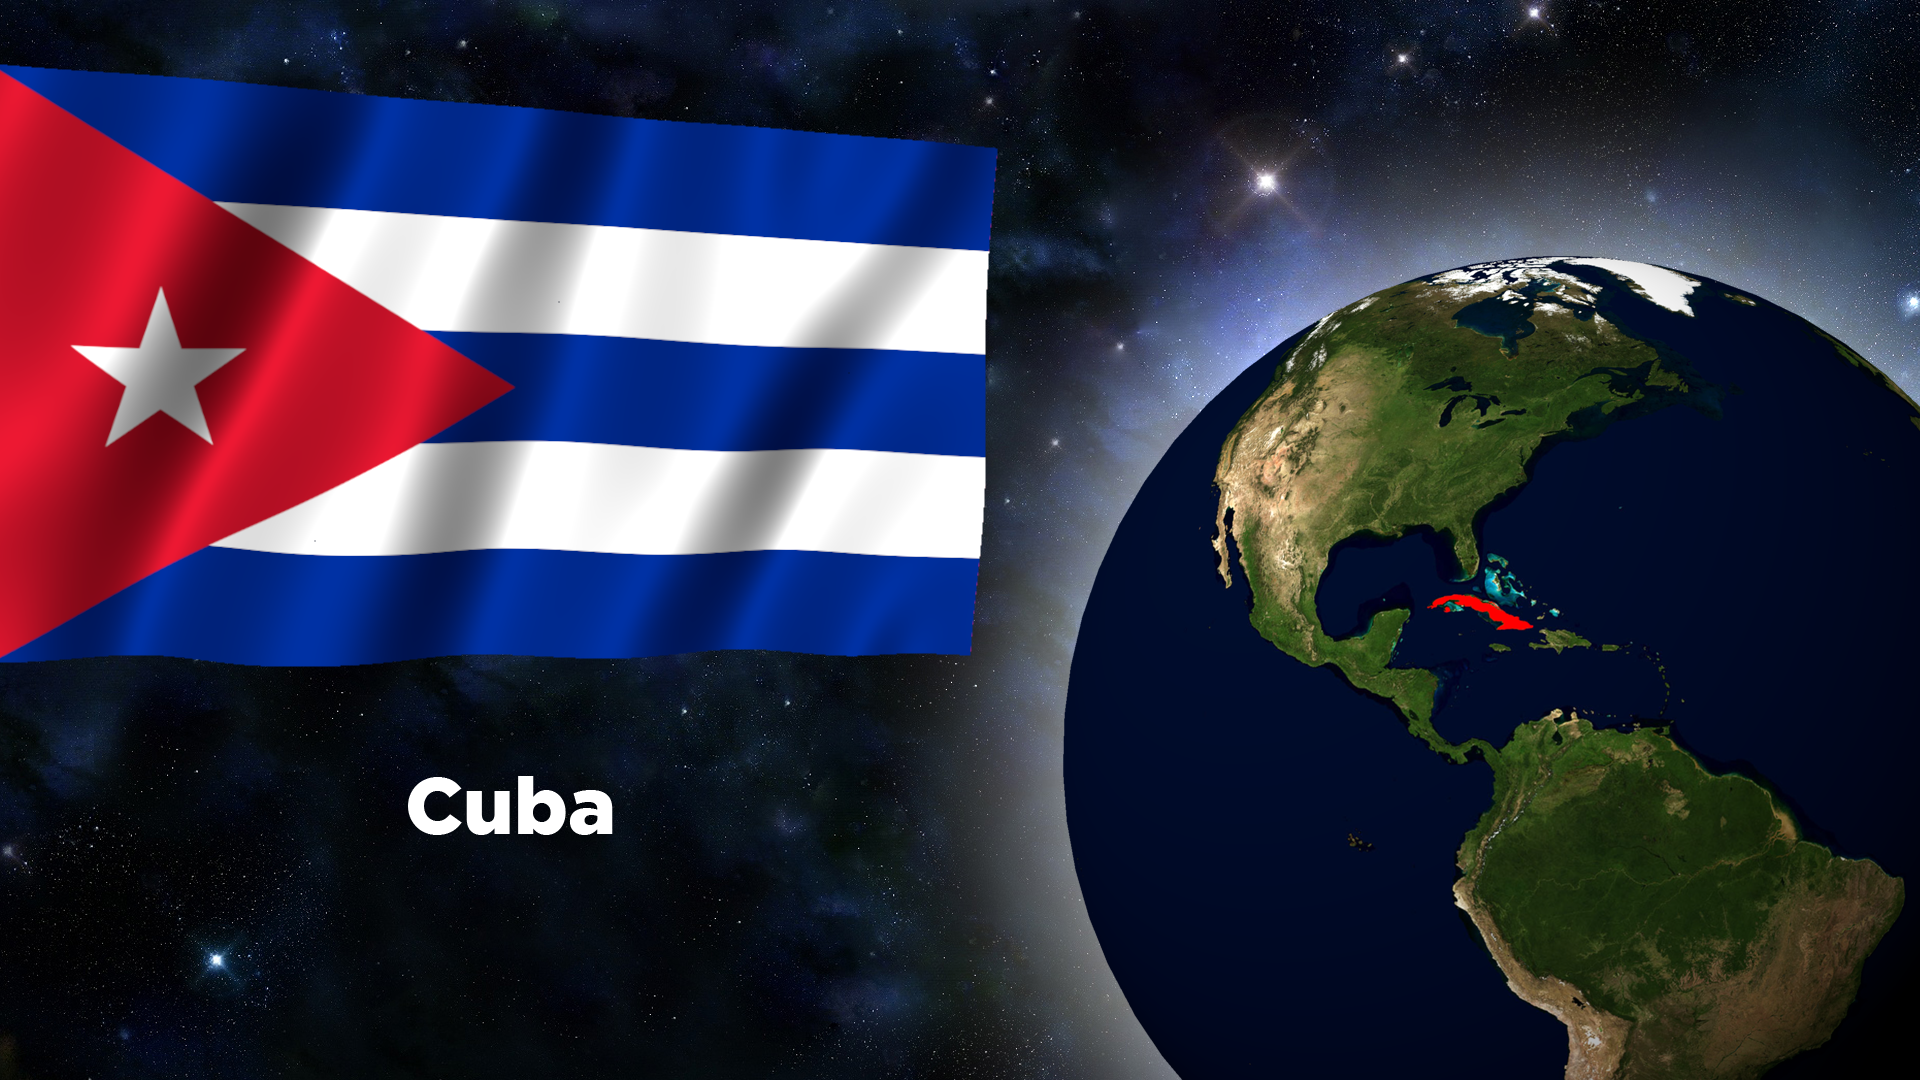 Flag Wallpaper   Cuba by darellnonis 1920x1080